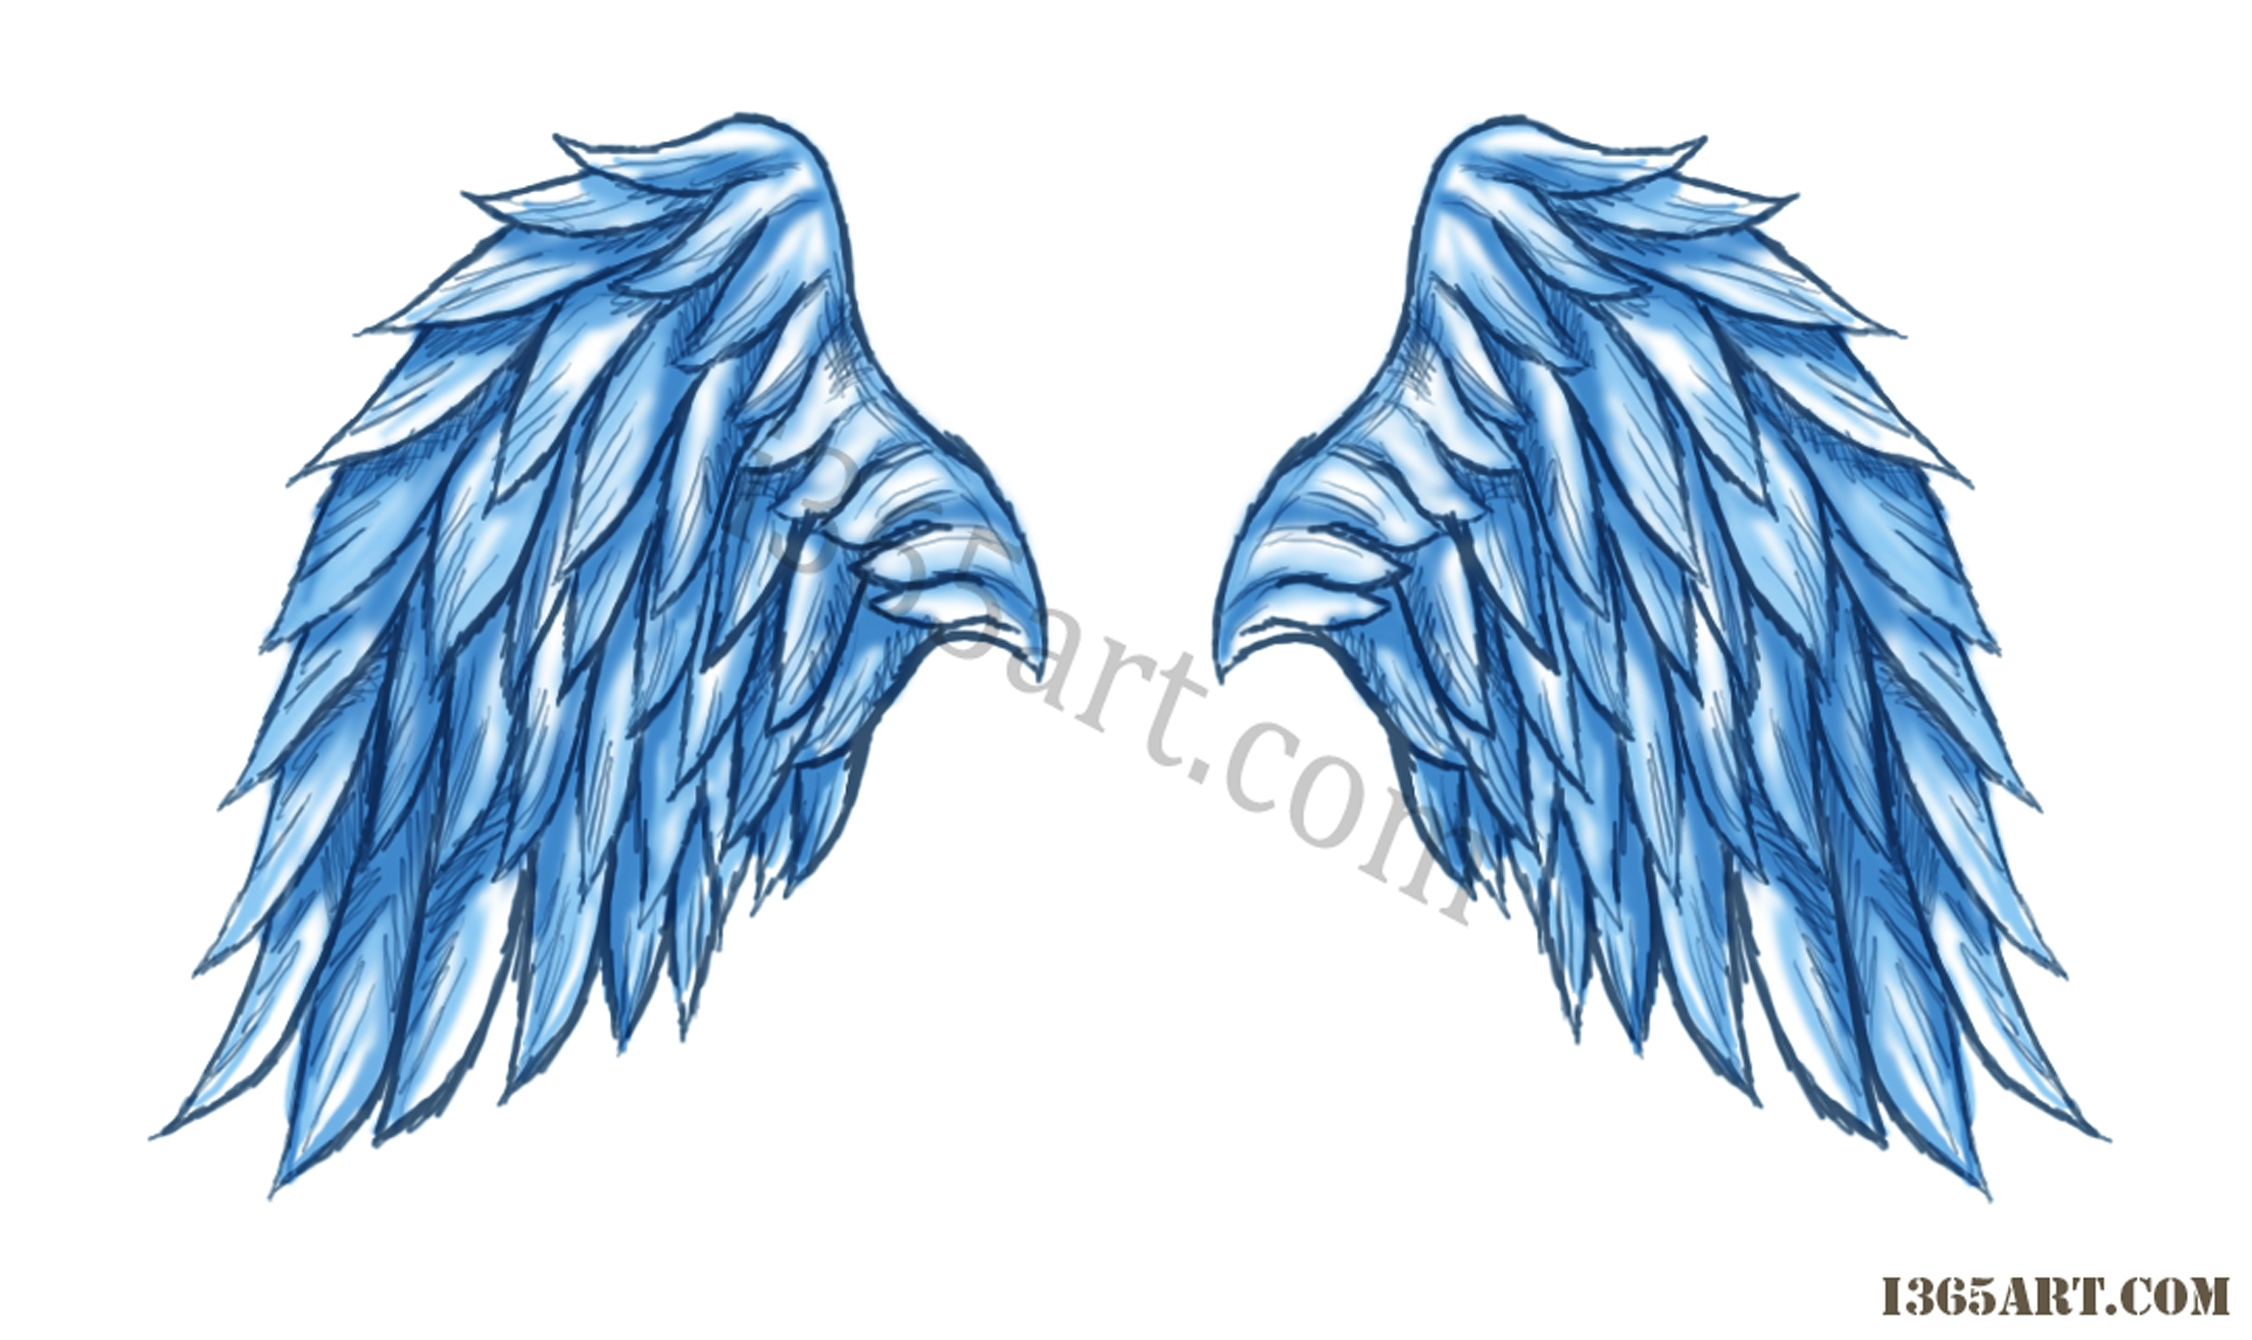 Day #43 Angel Wings | I 365 Art